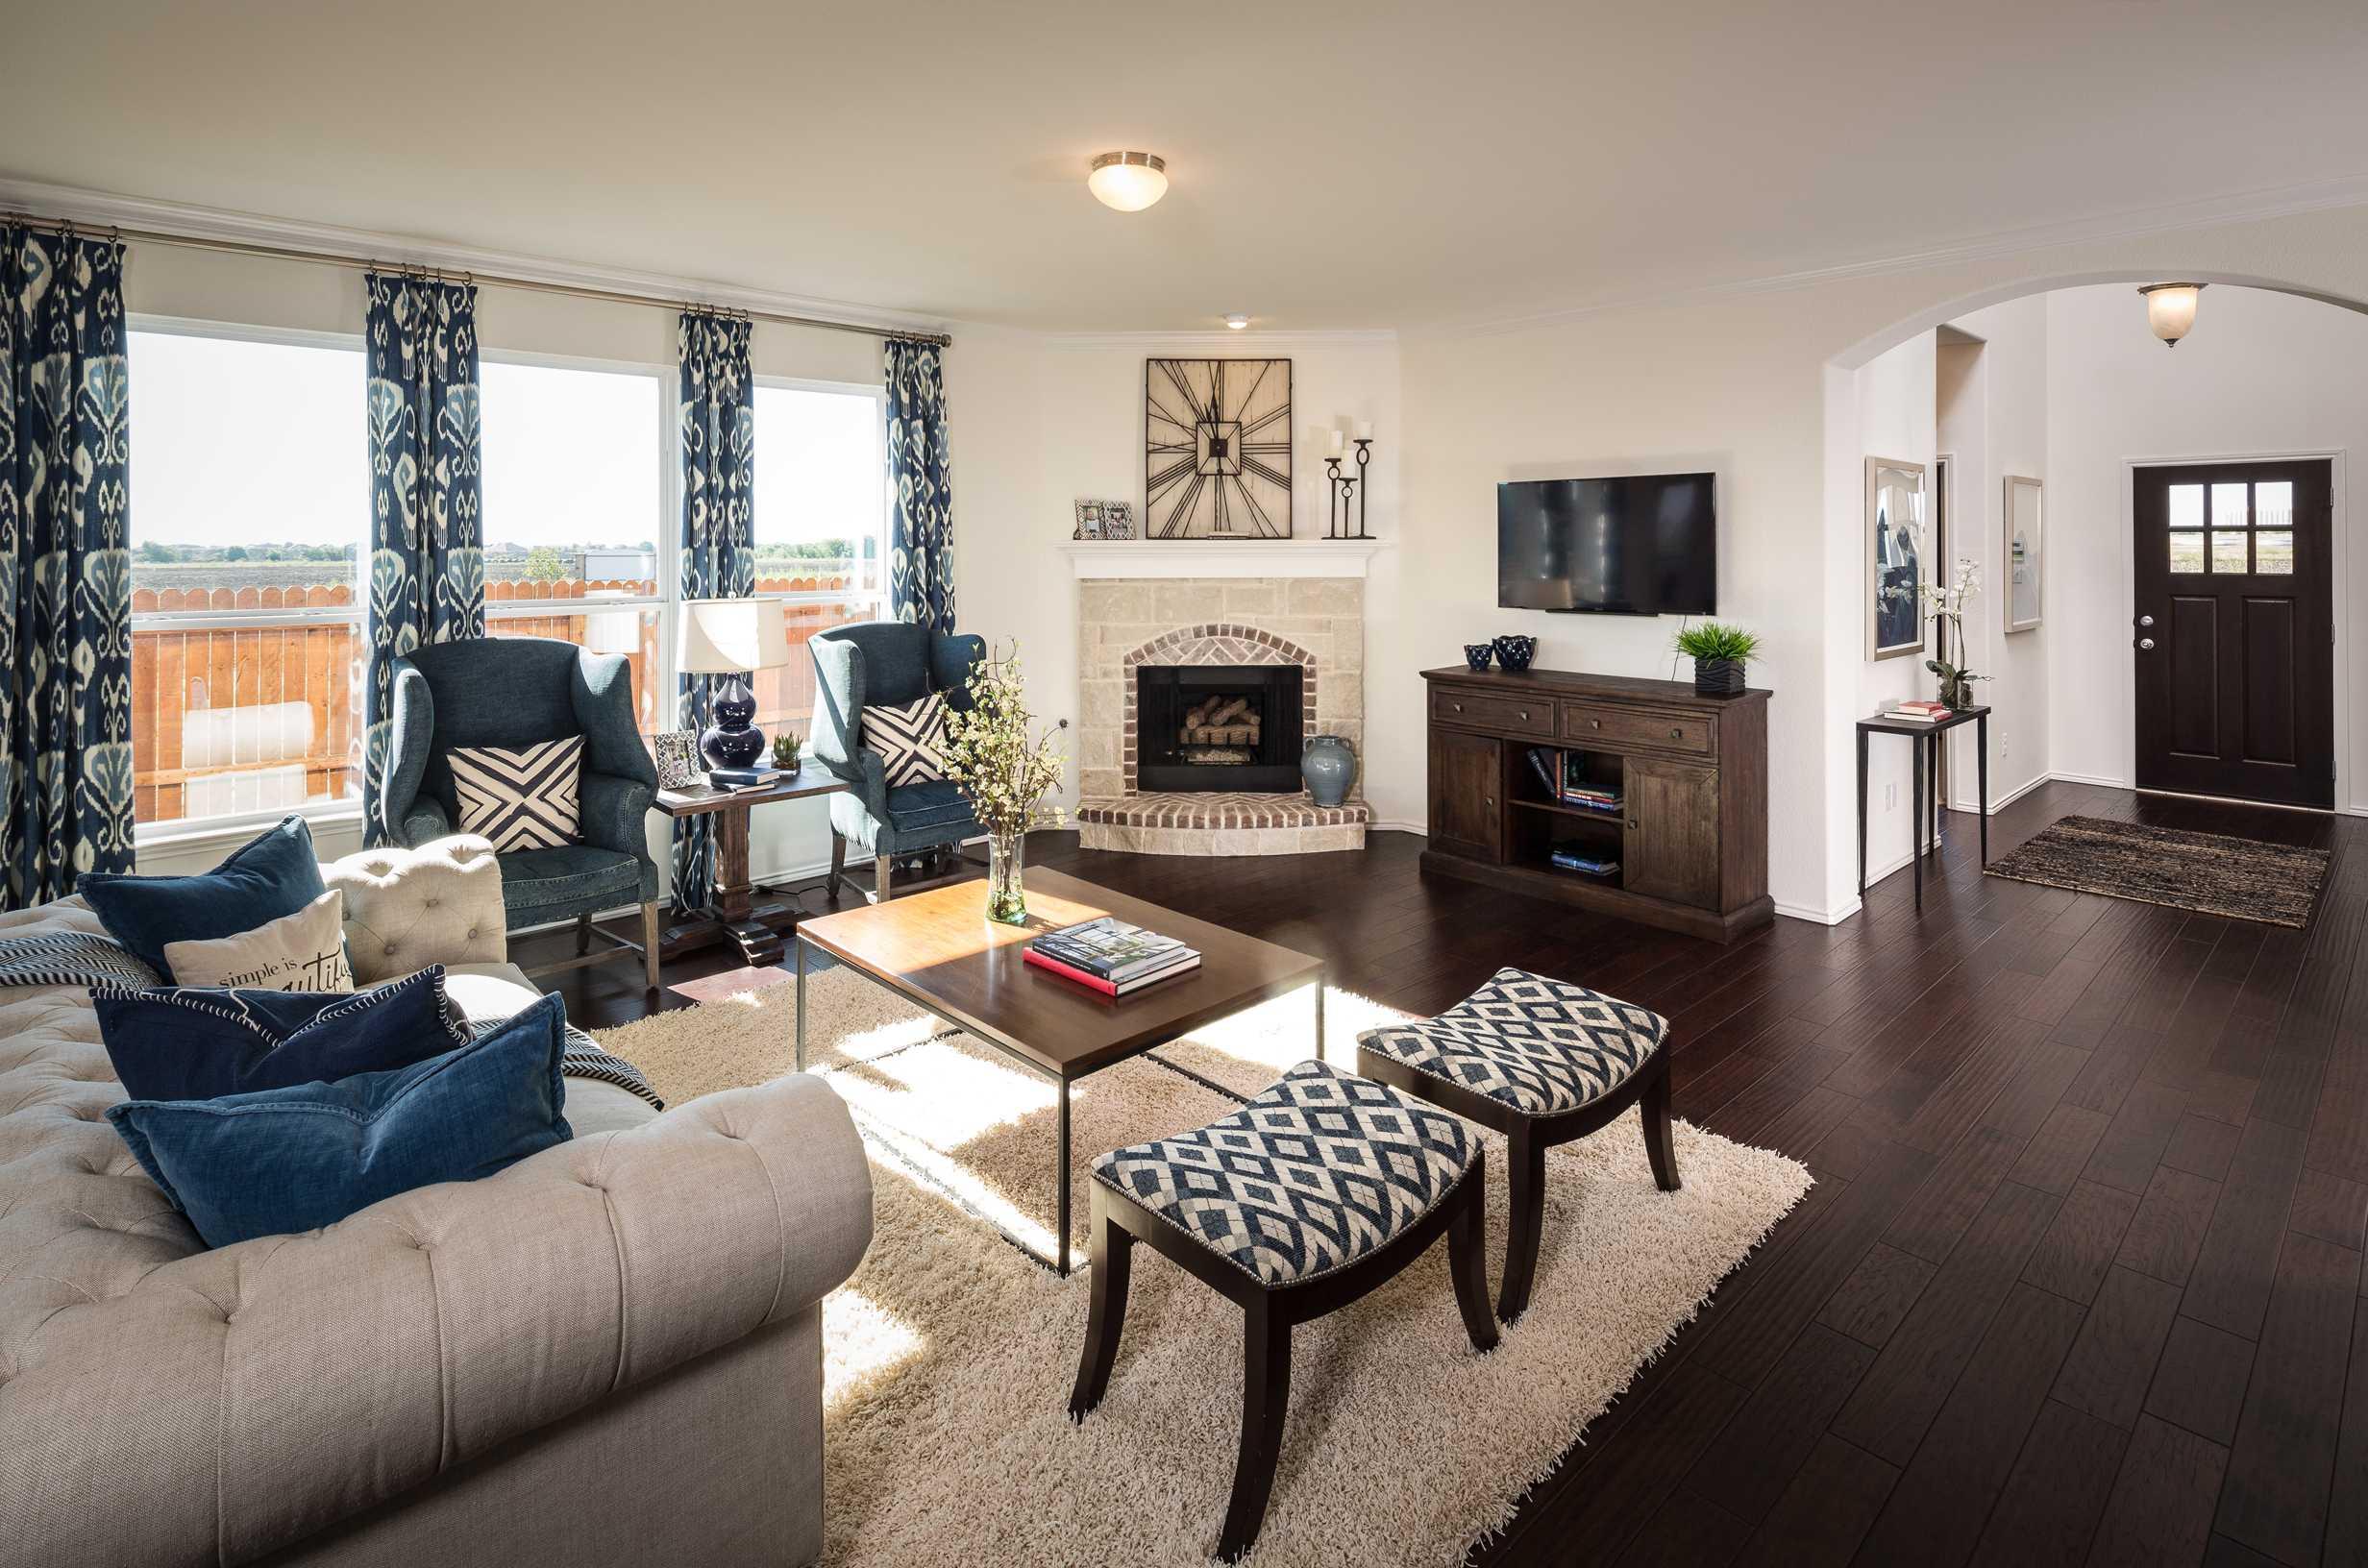 New Home Plan SUTH in Northlake TX